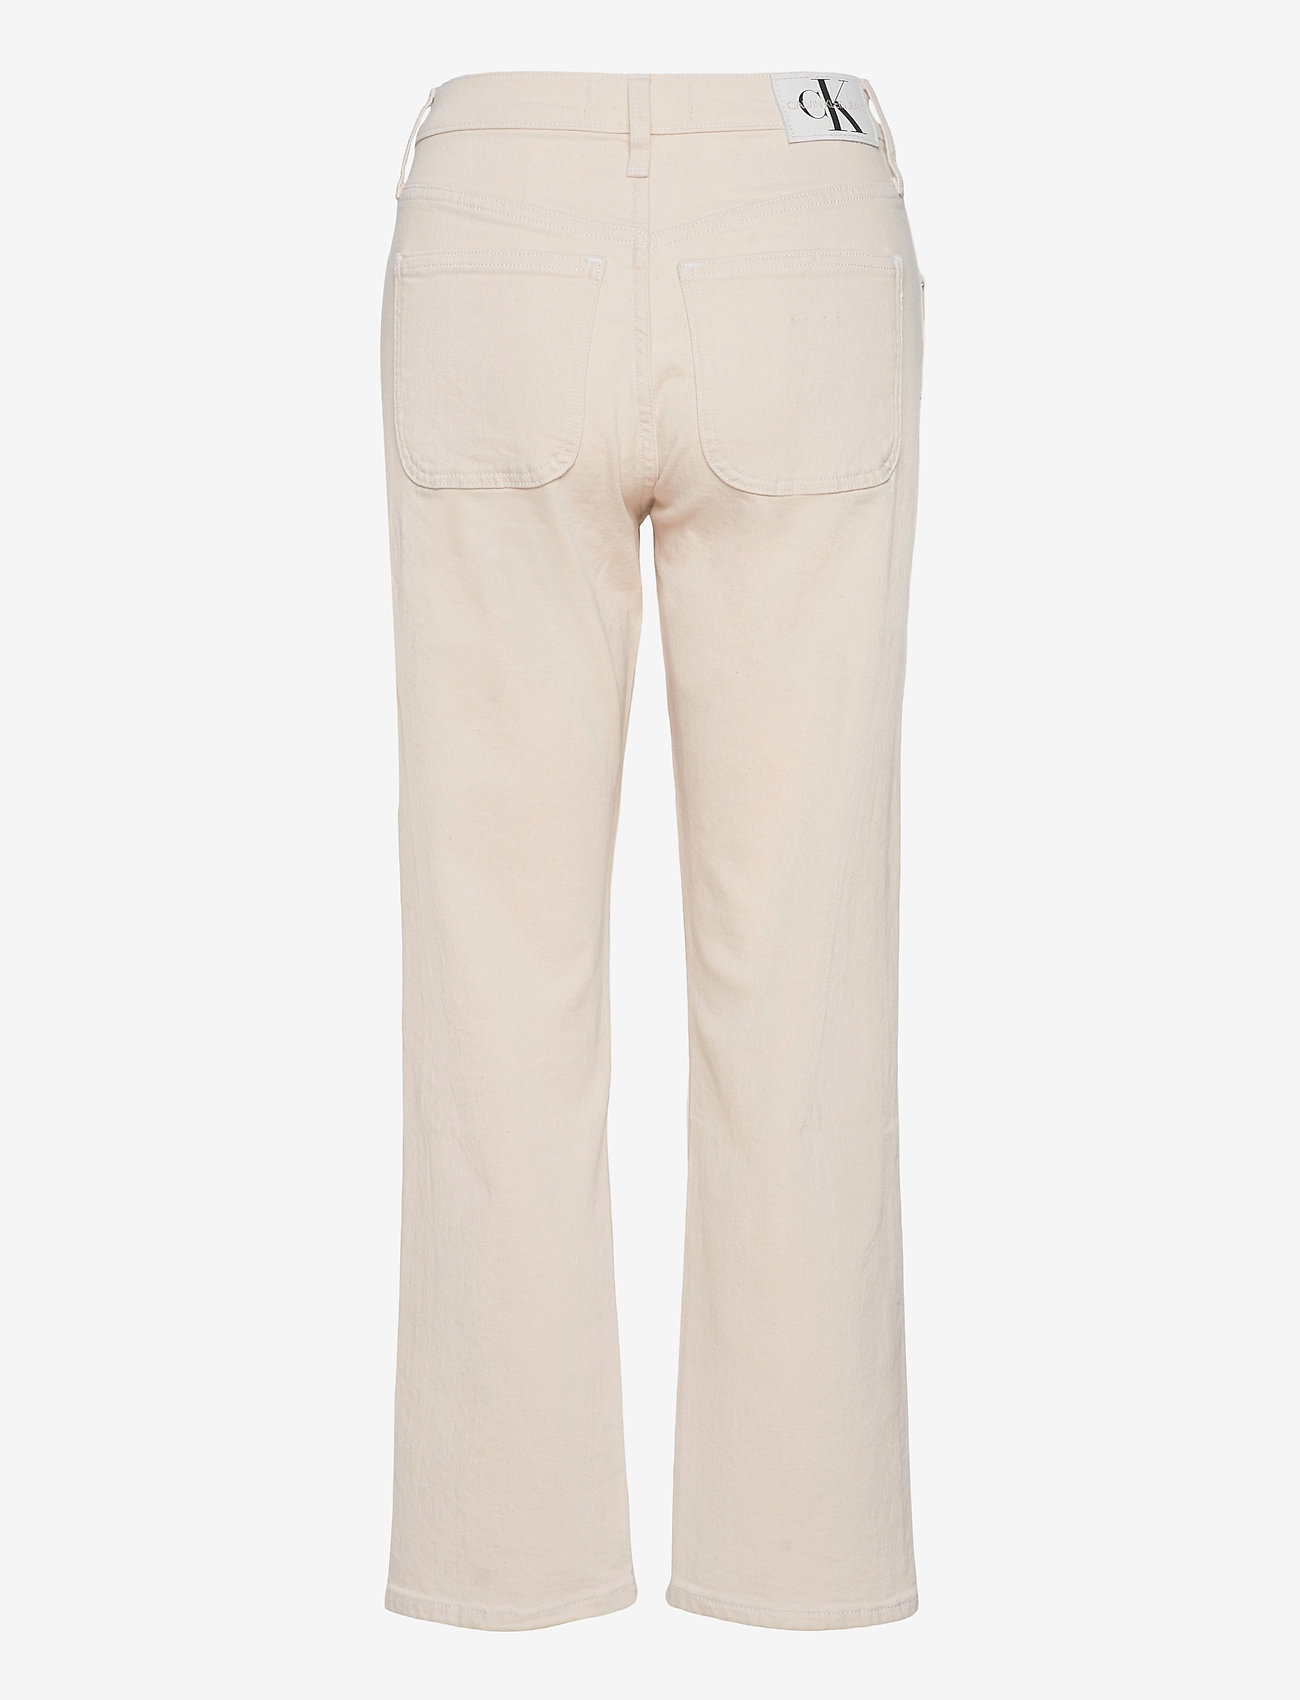 Calvin Klein Jeans - HIGH RISE STRAIGHT ANKLE - straight jeans - denim light - 1